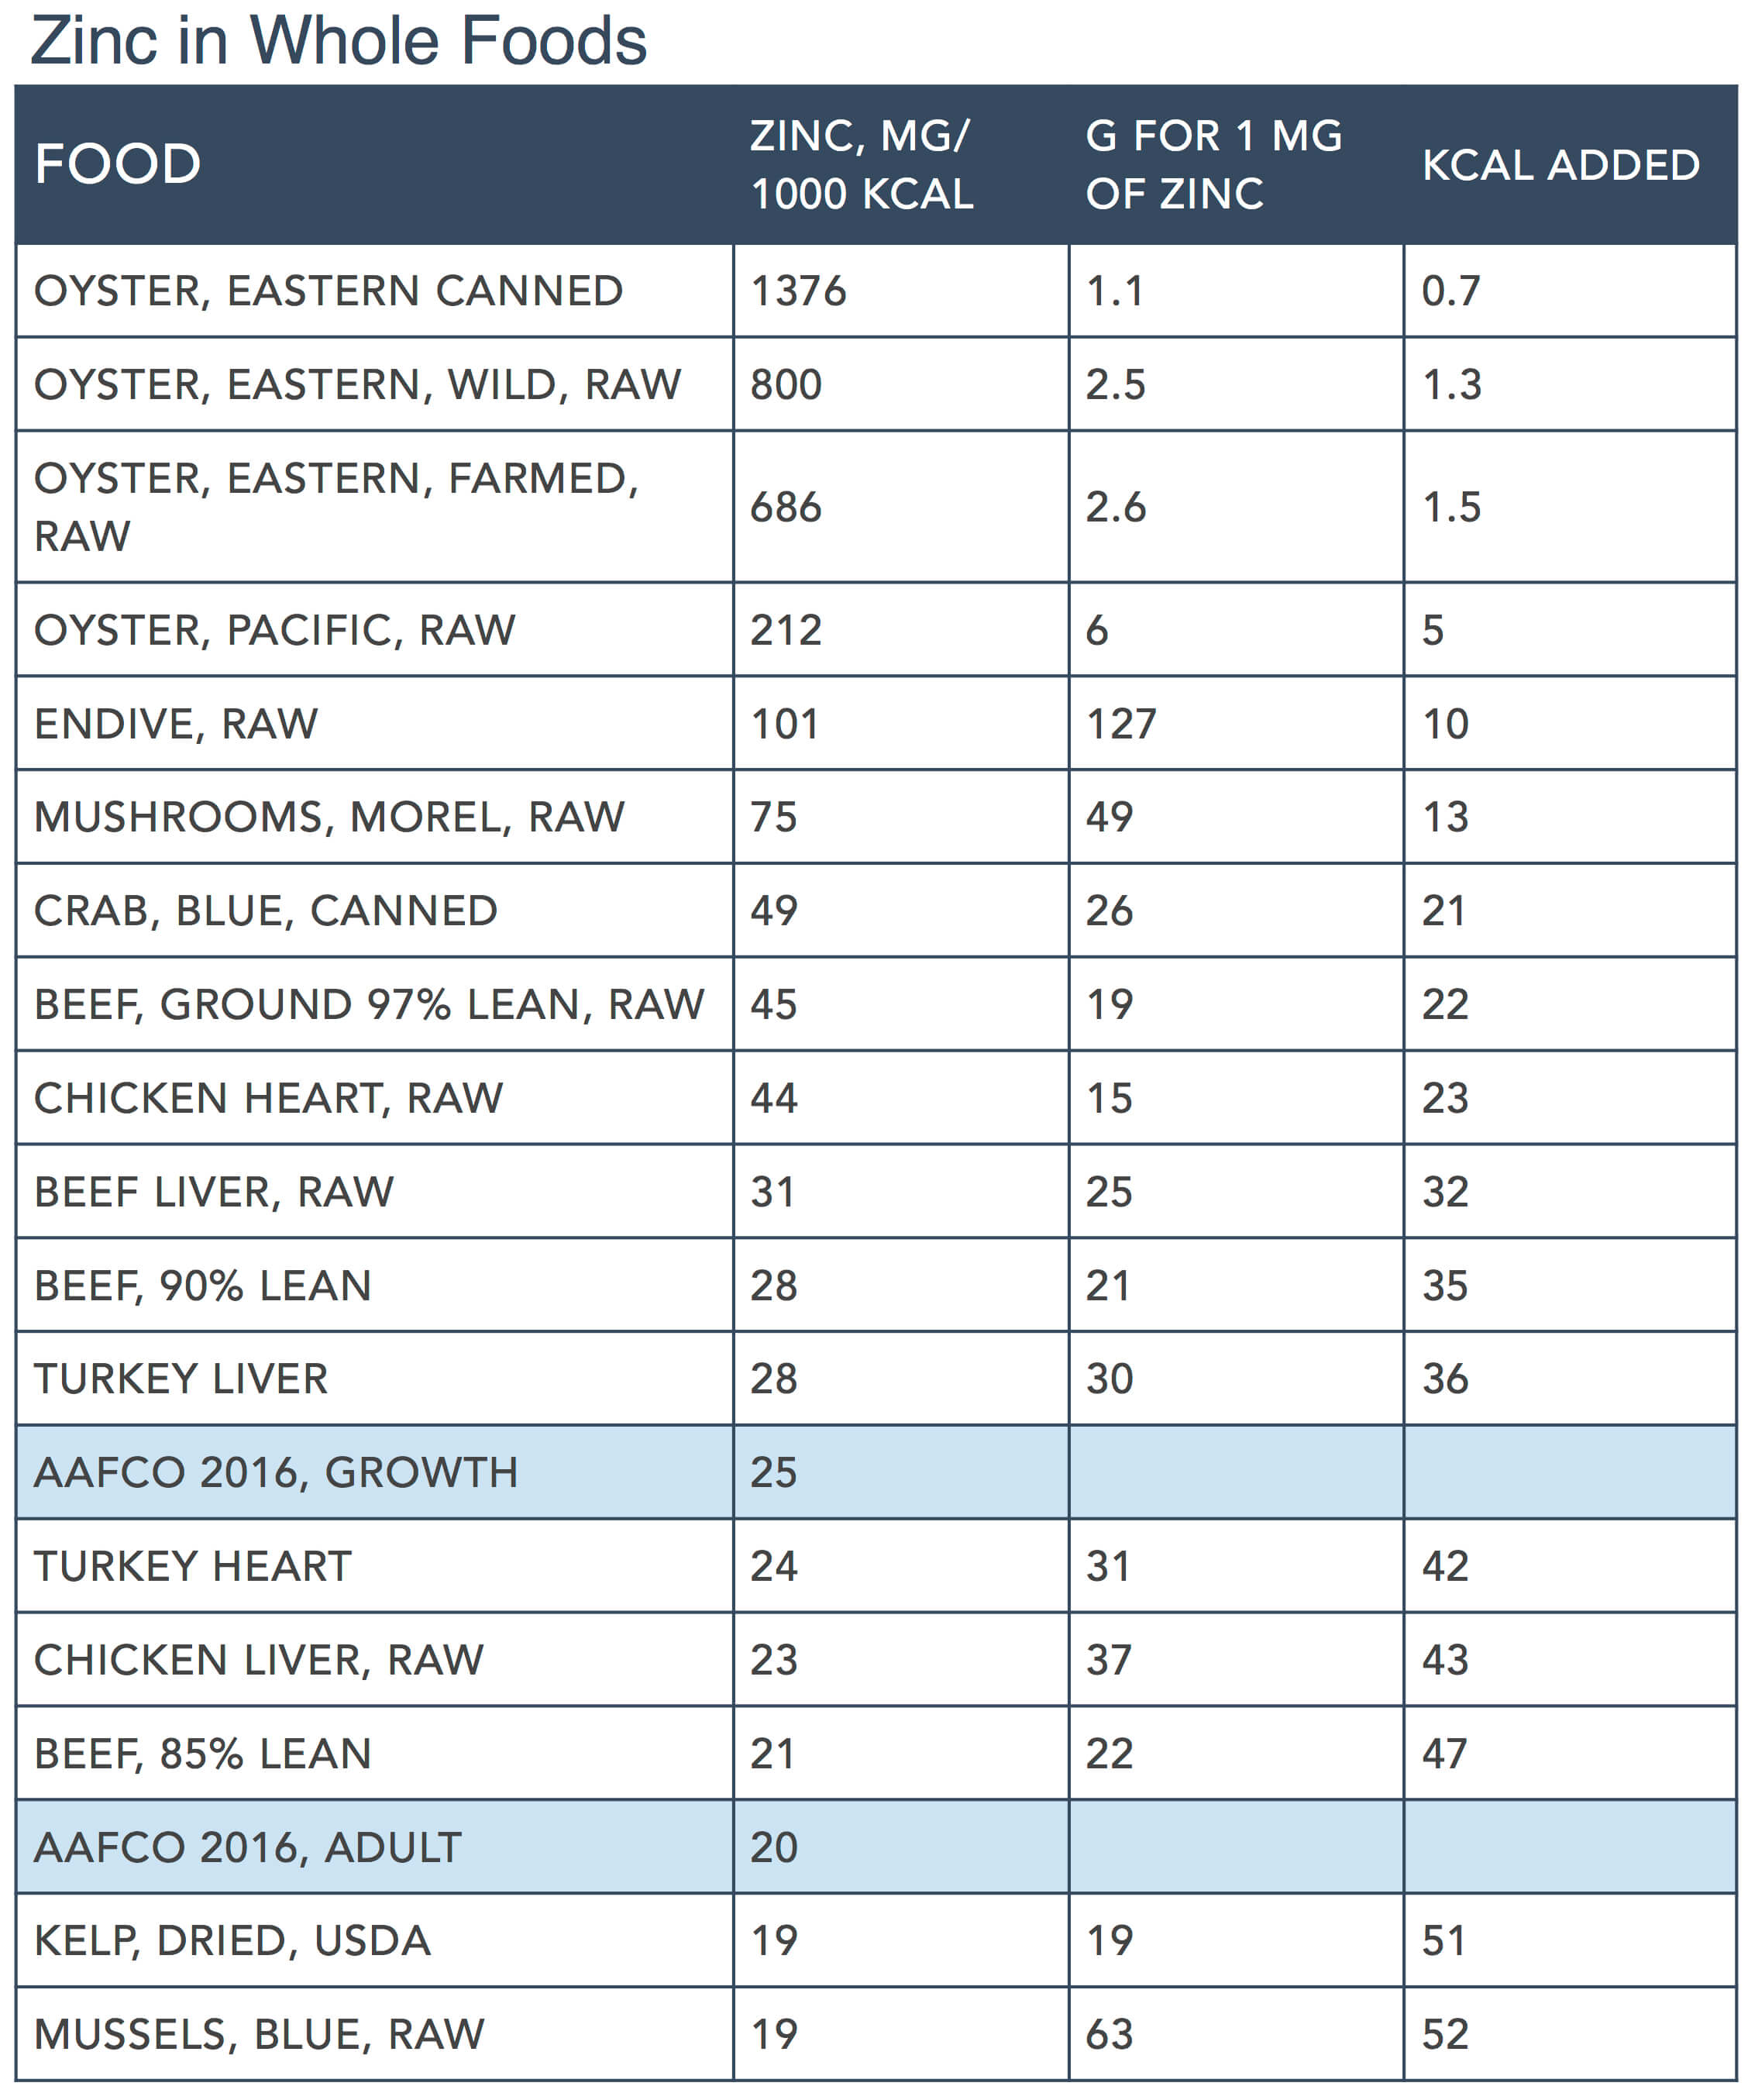 Focus on Nutrients Part:2 by Steve Brown - Zinc Whole Foods